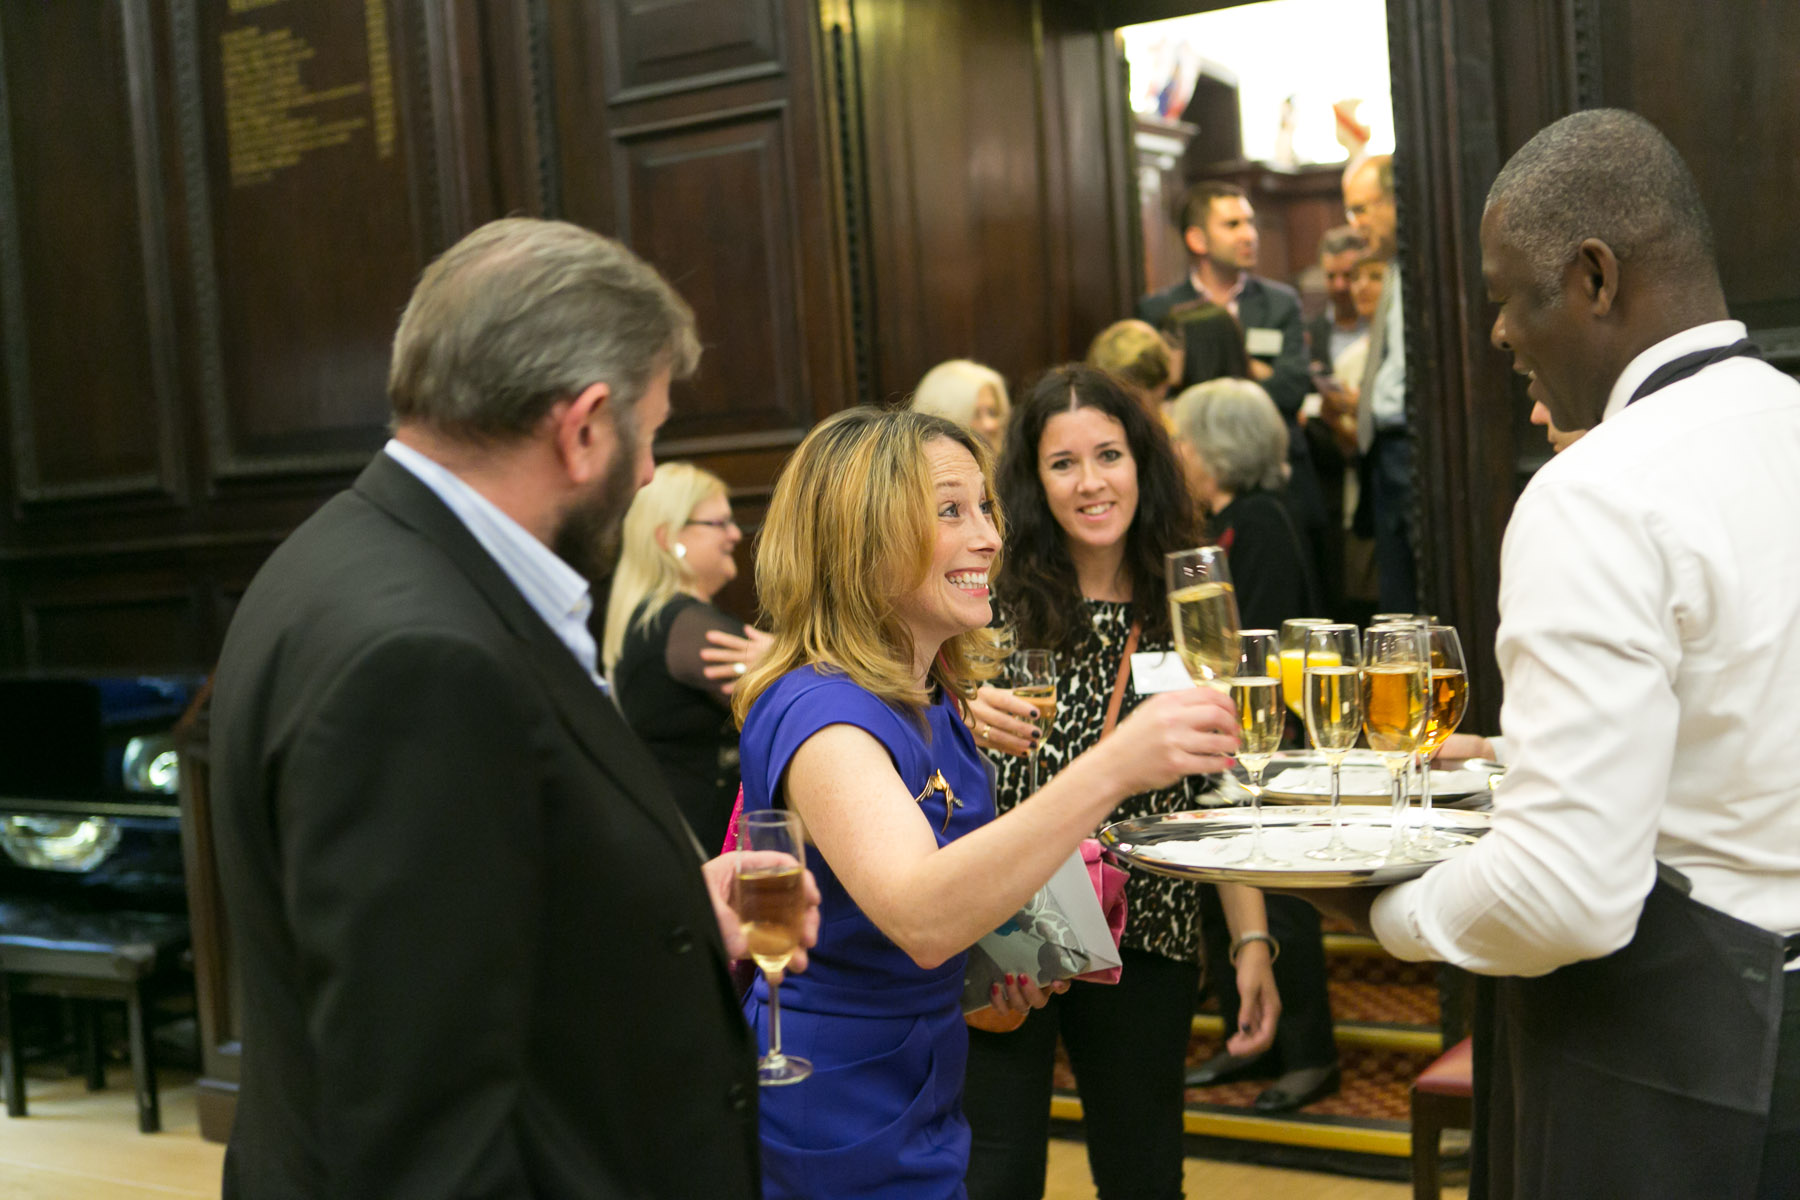 Tim Kinninmont, Naomi Kerbal, Beverley Jones